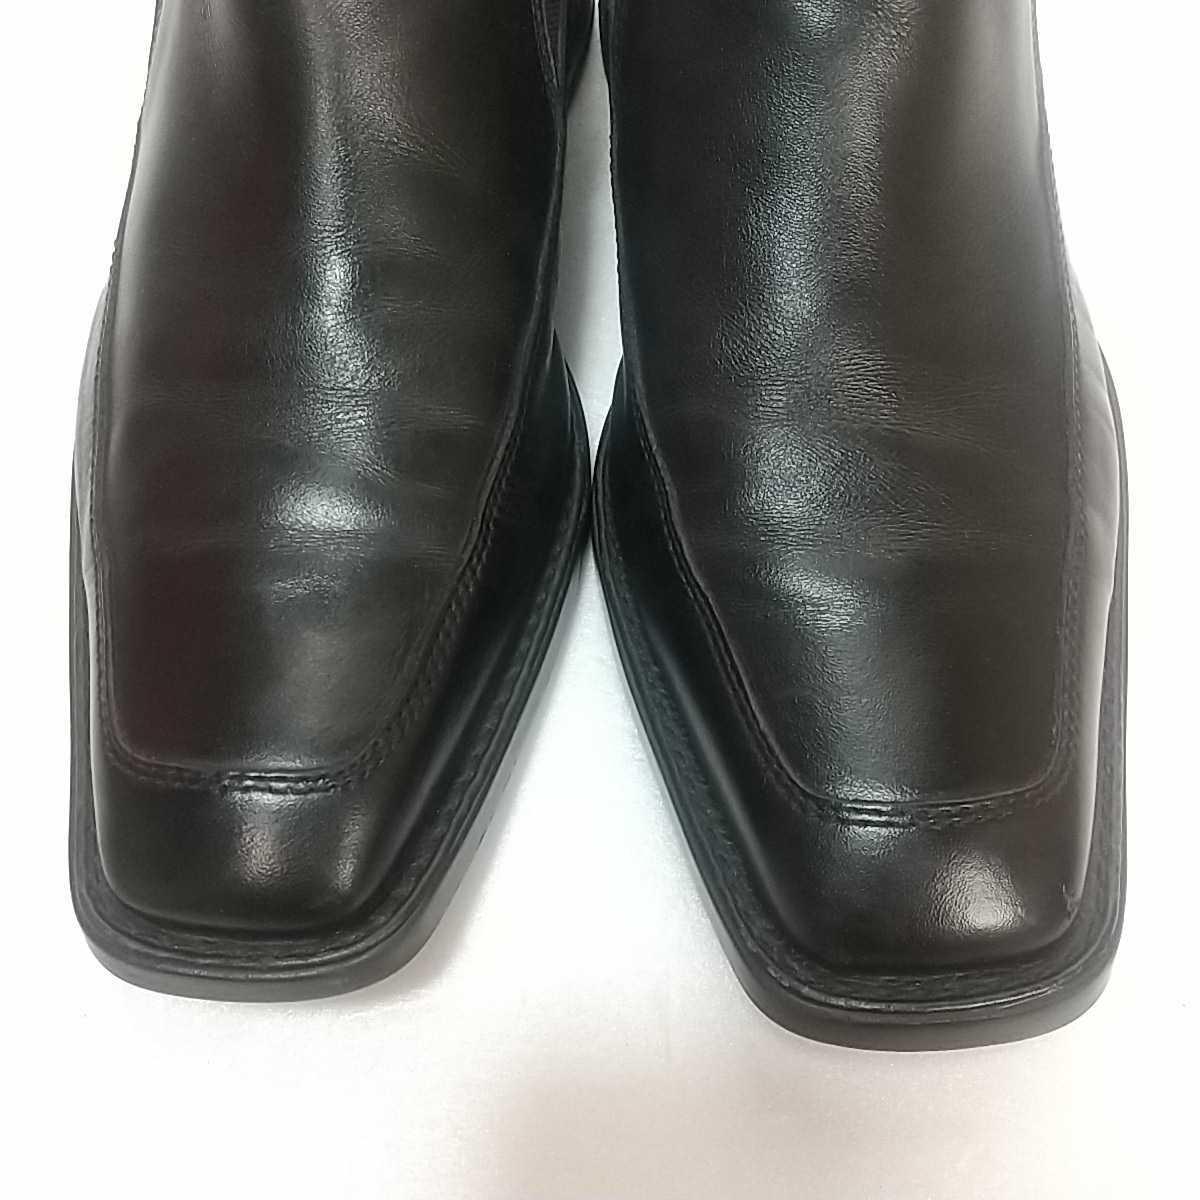 Clarks クラークス レザー サイドゴアブーツ ショート UK9 27.5cm 黒 ブラック 革靴 _画像2